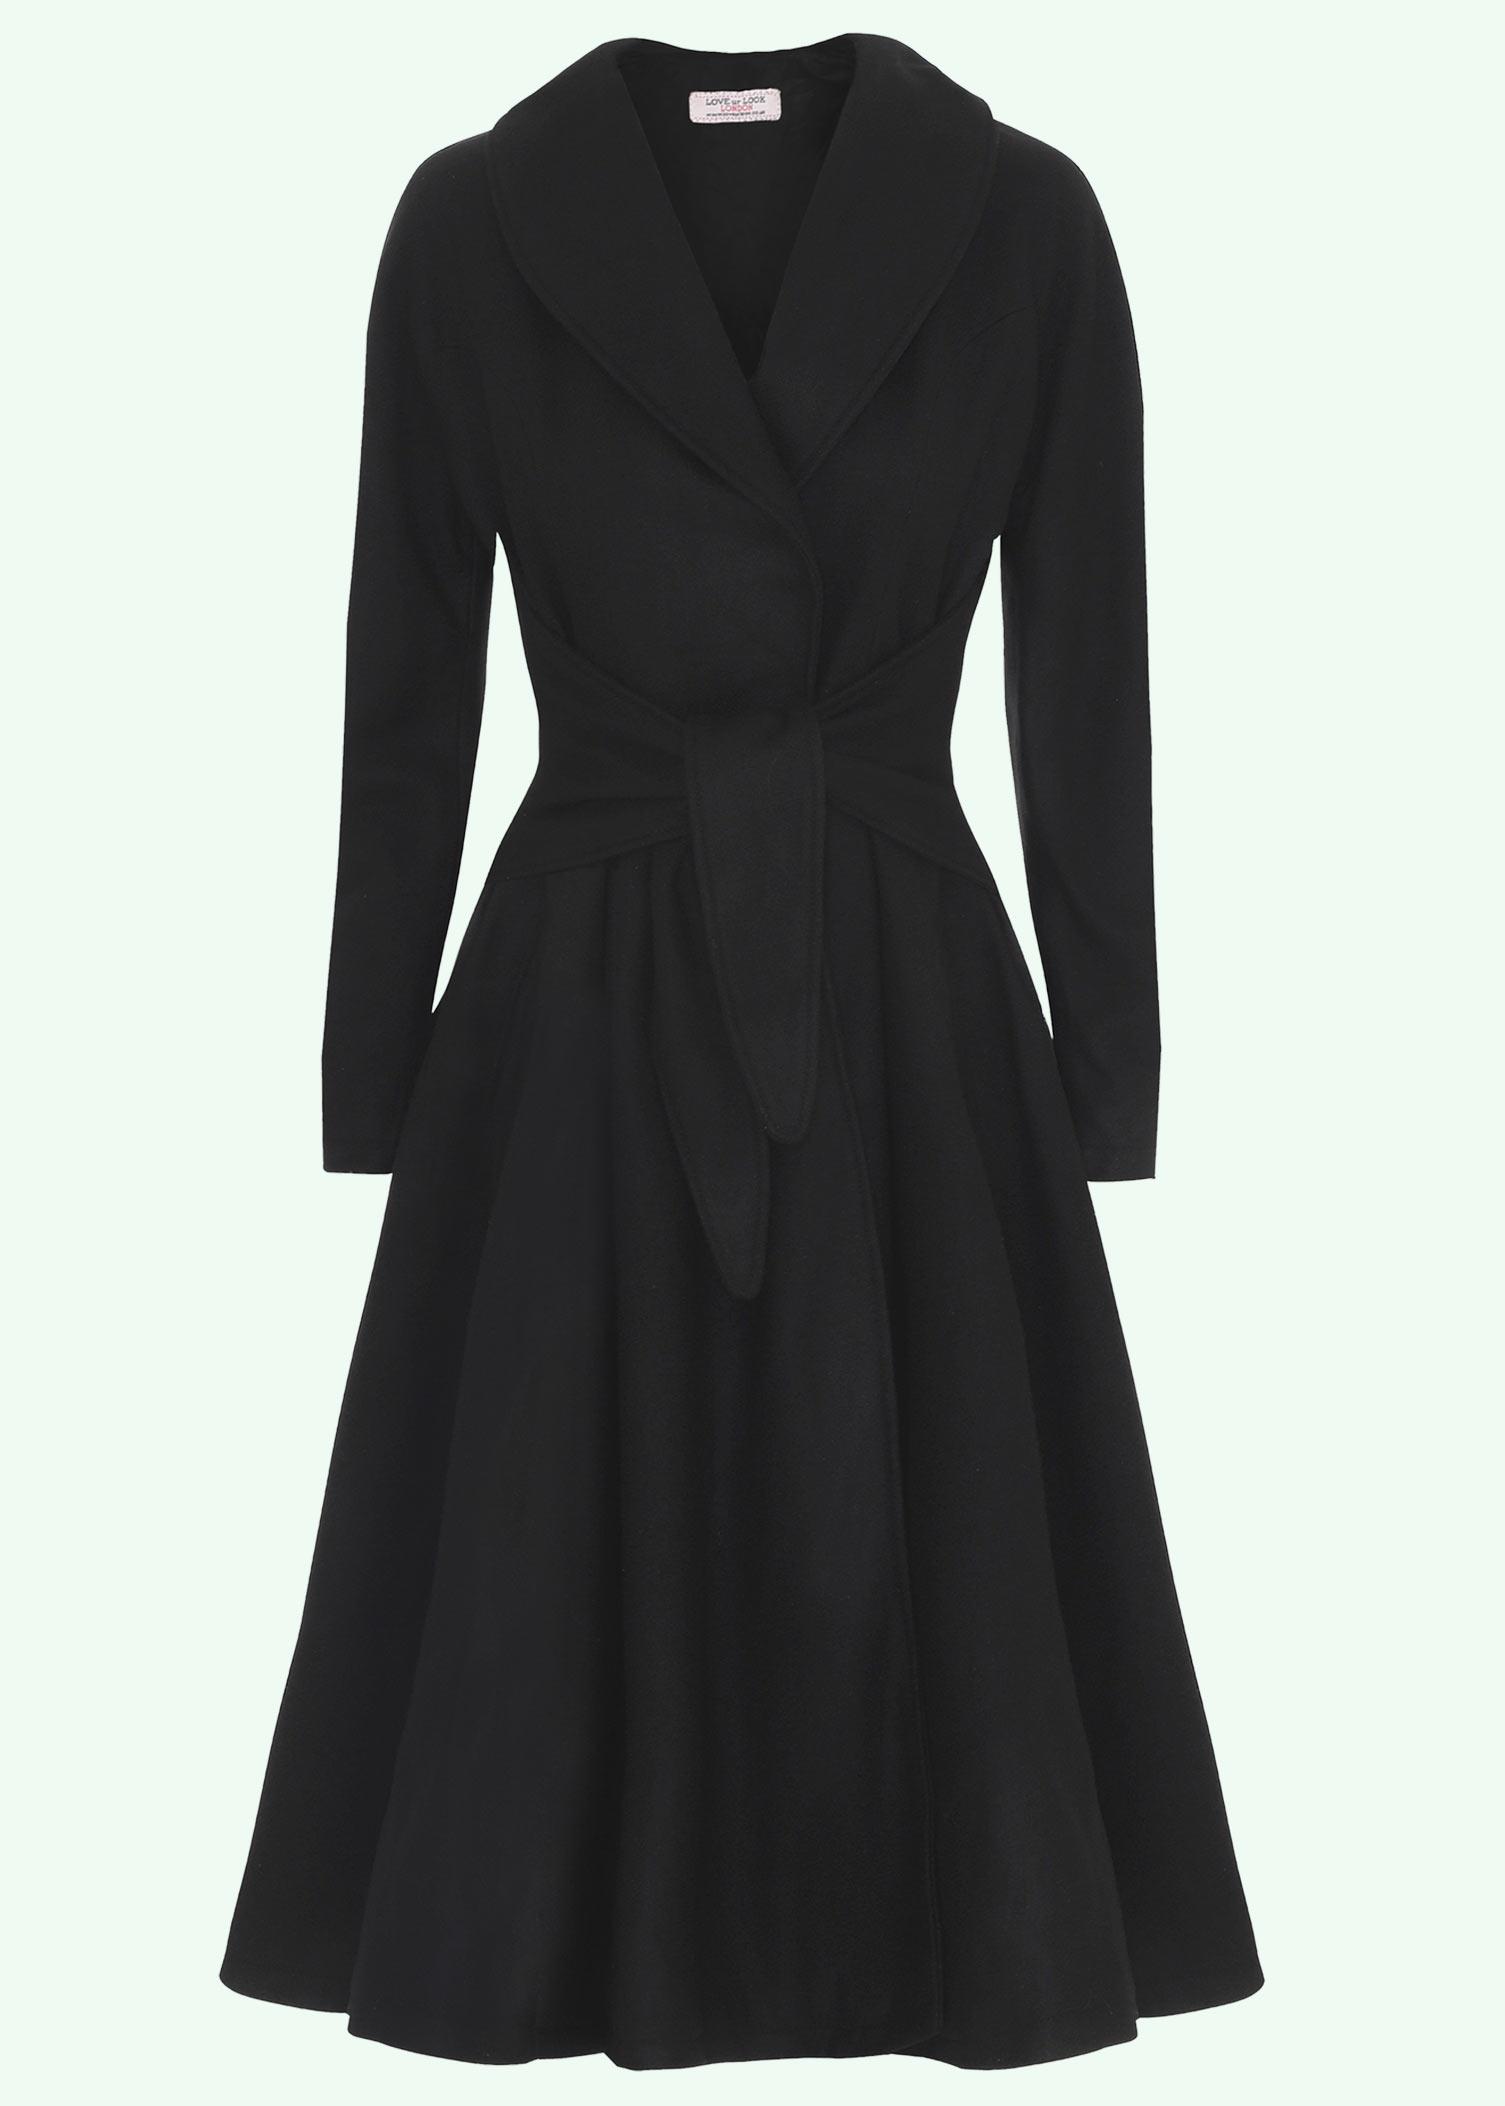 Klassisk 50'er uldfrakke fra Mondo Kaos